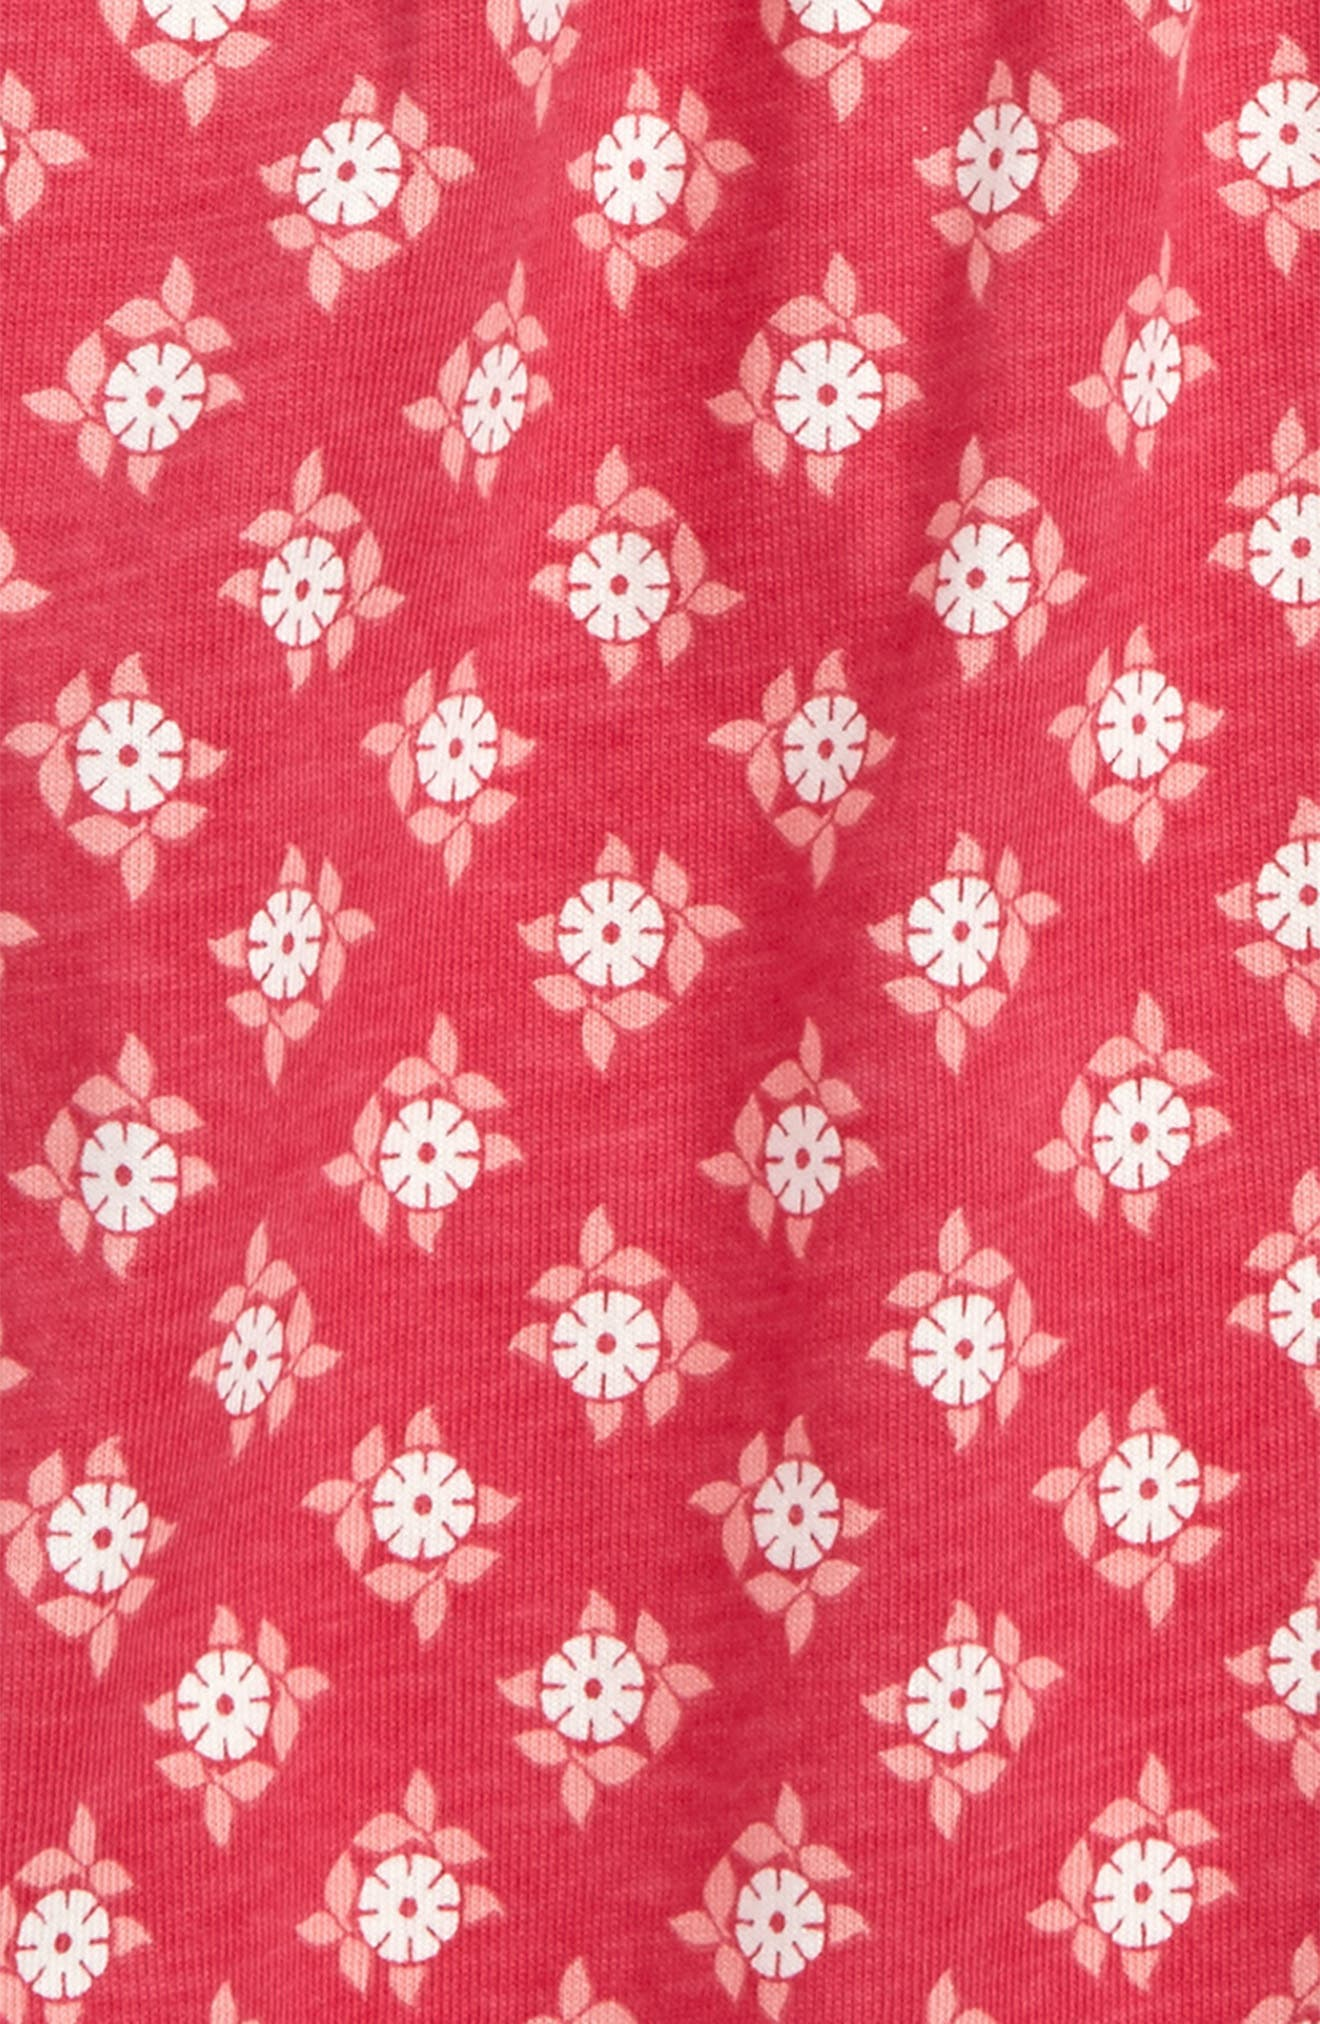 Sunburst Dress,                             Alternate thumbnail 2, color,                             658